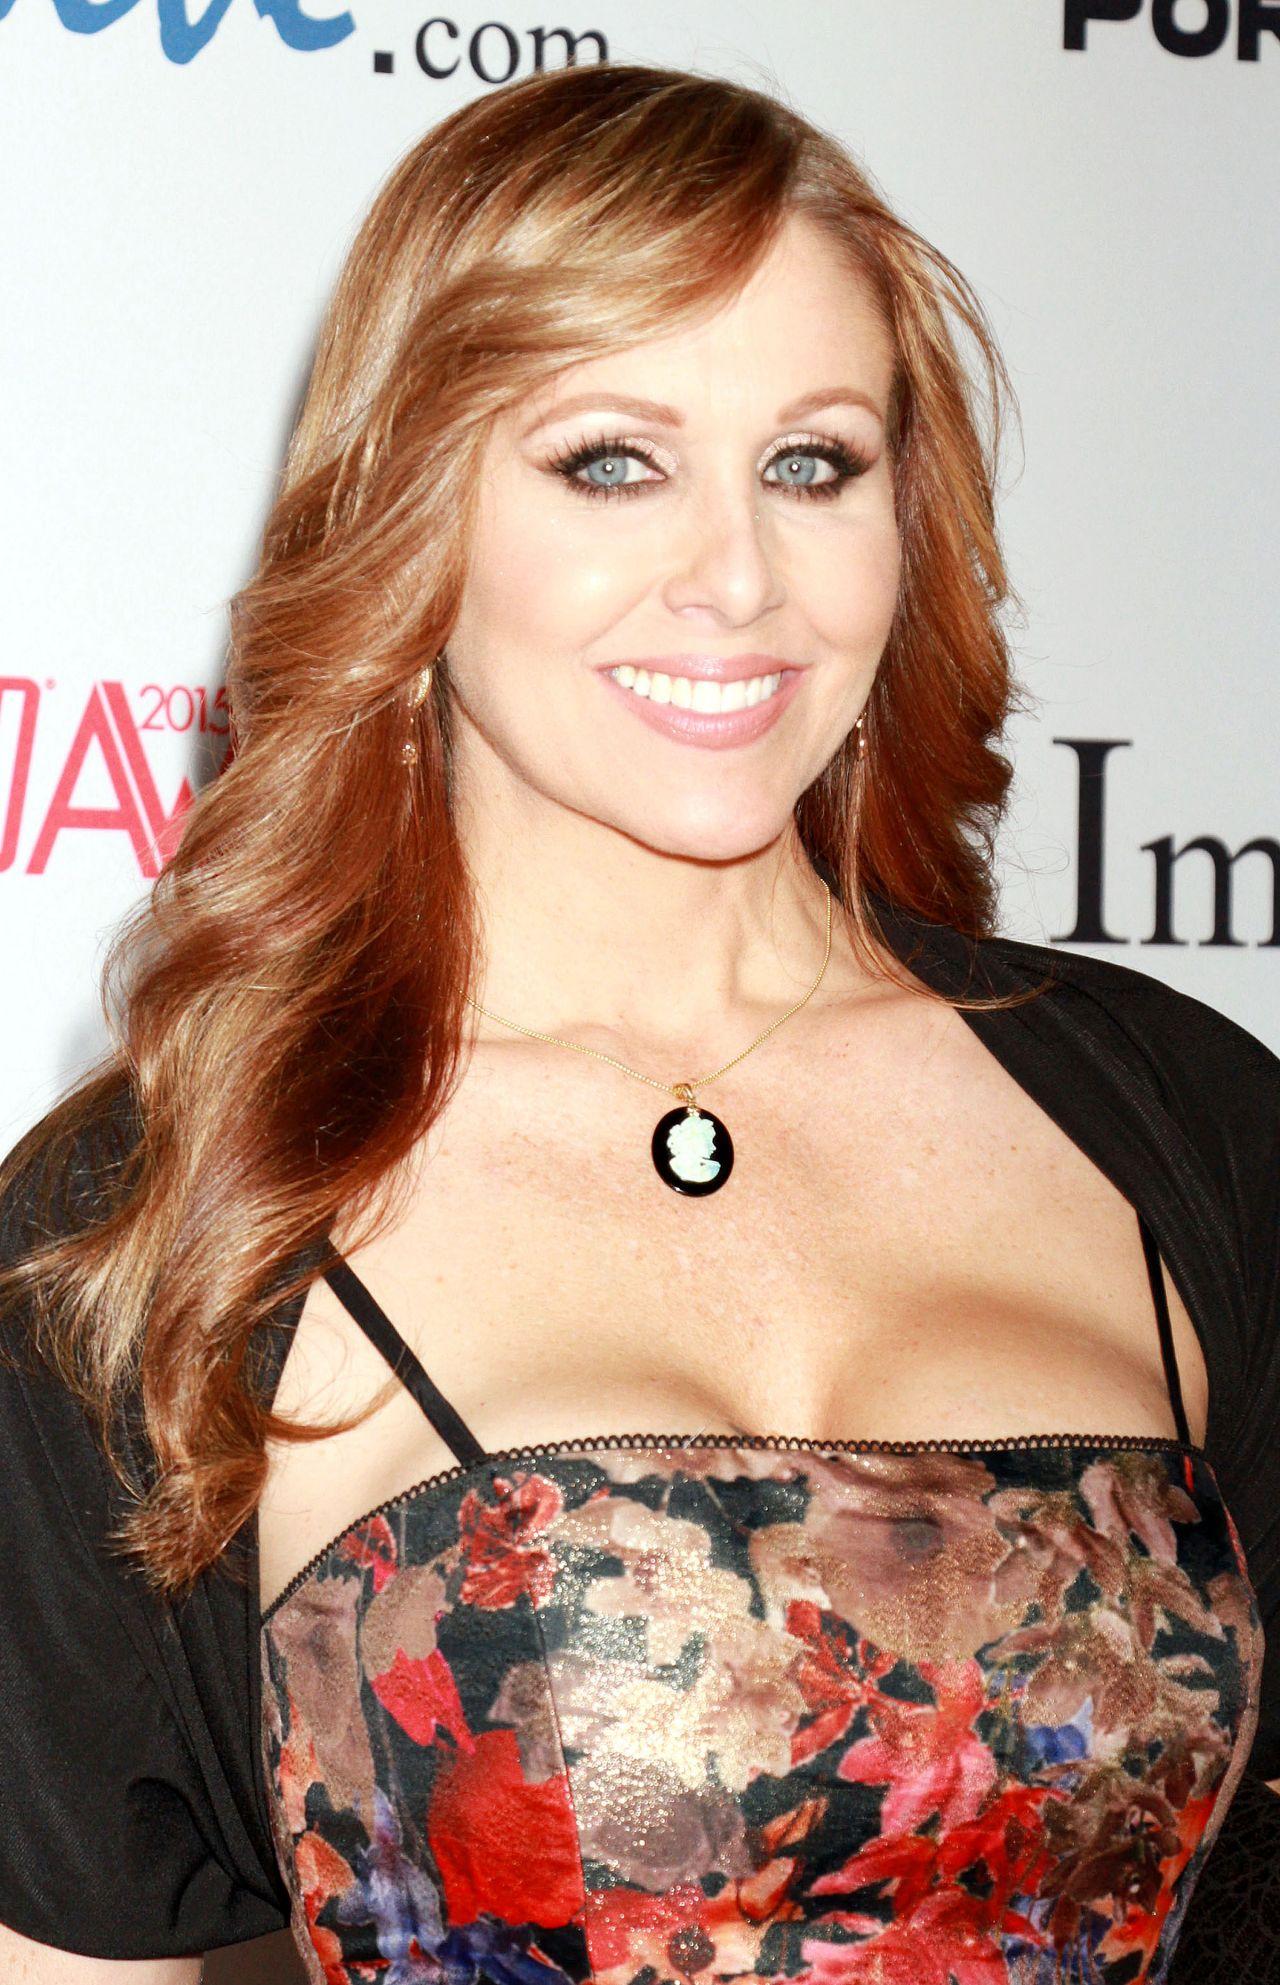 Julia Ann 2015 Avn Awards In Las Vegas